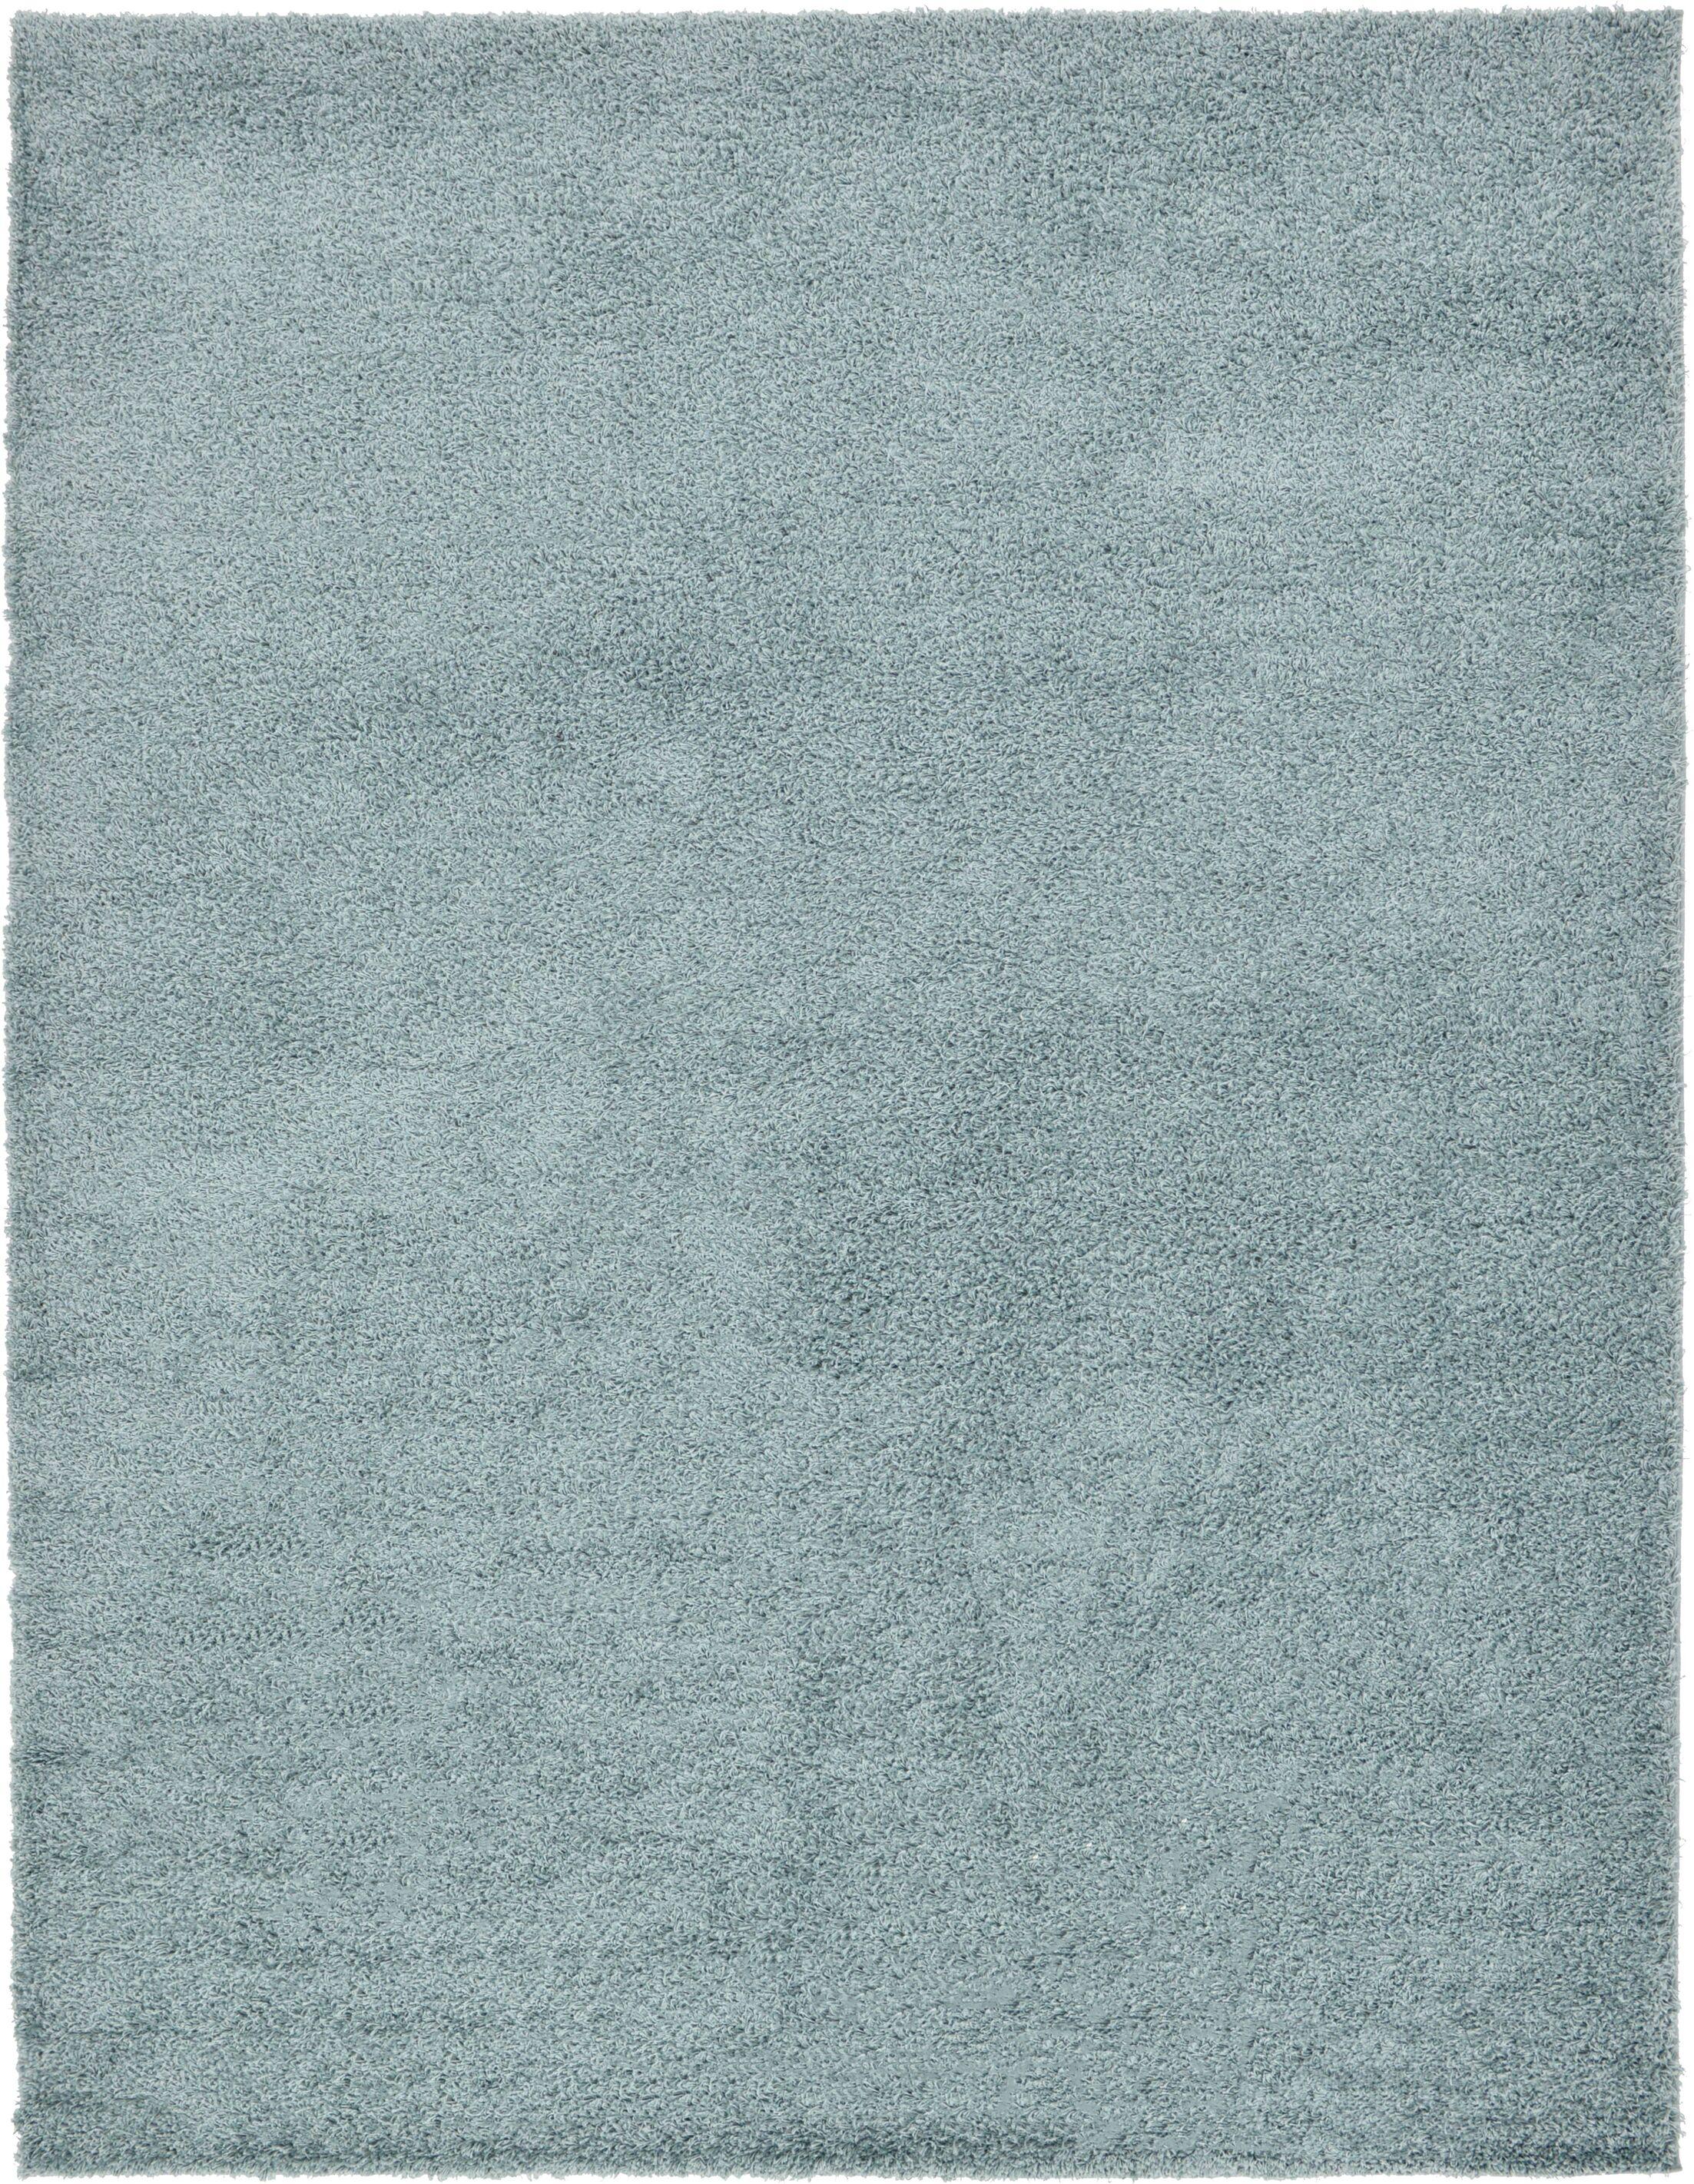 Lilah Light Blue Area Rug Rug Size: Rectangle 9' x 12'